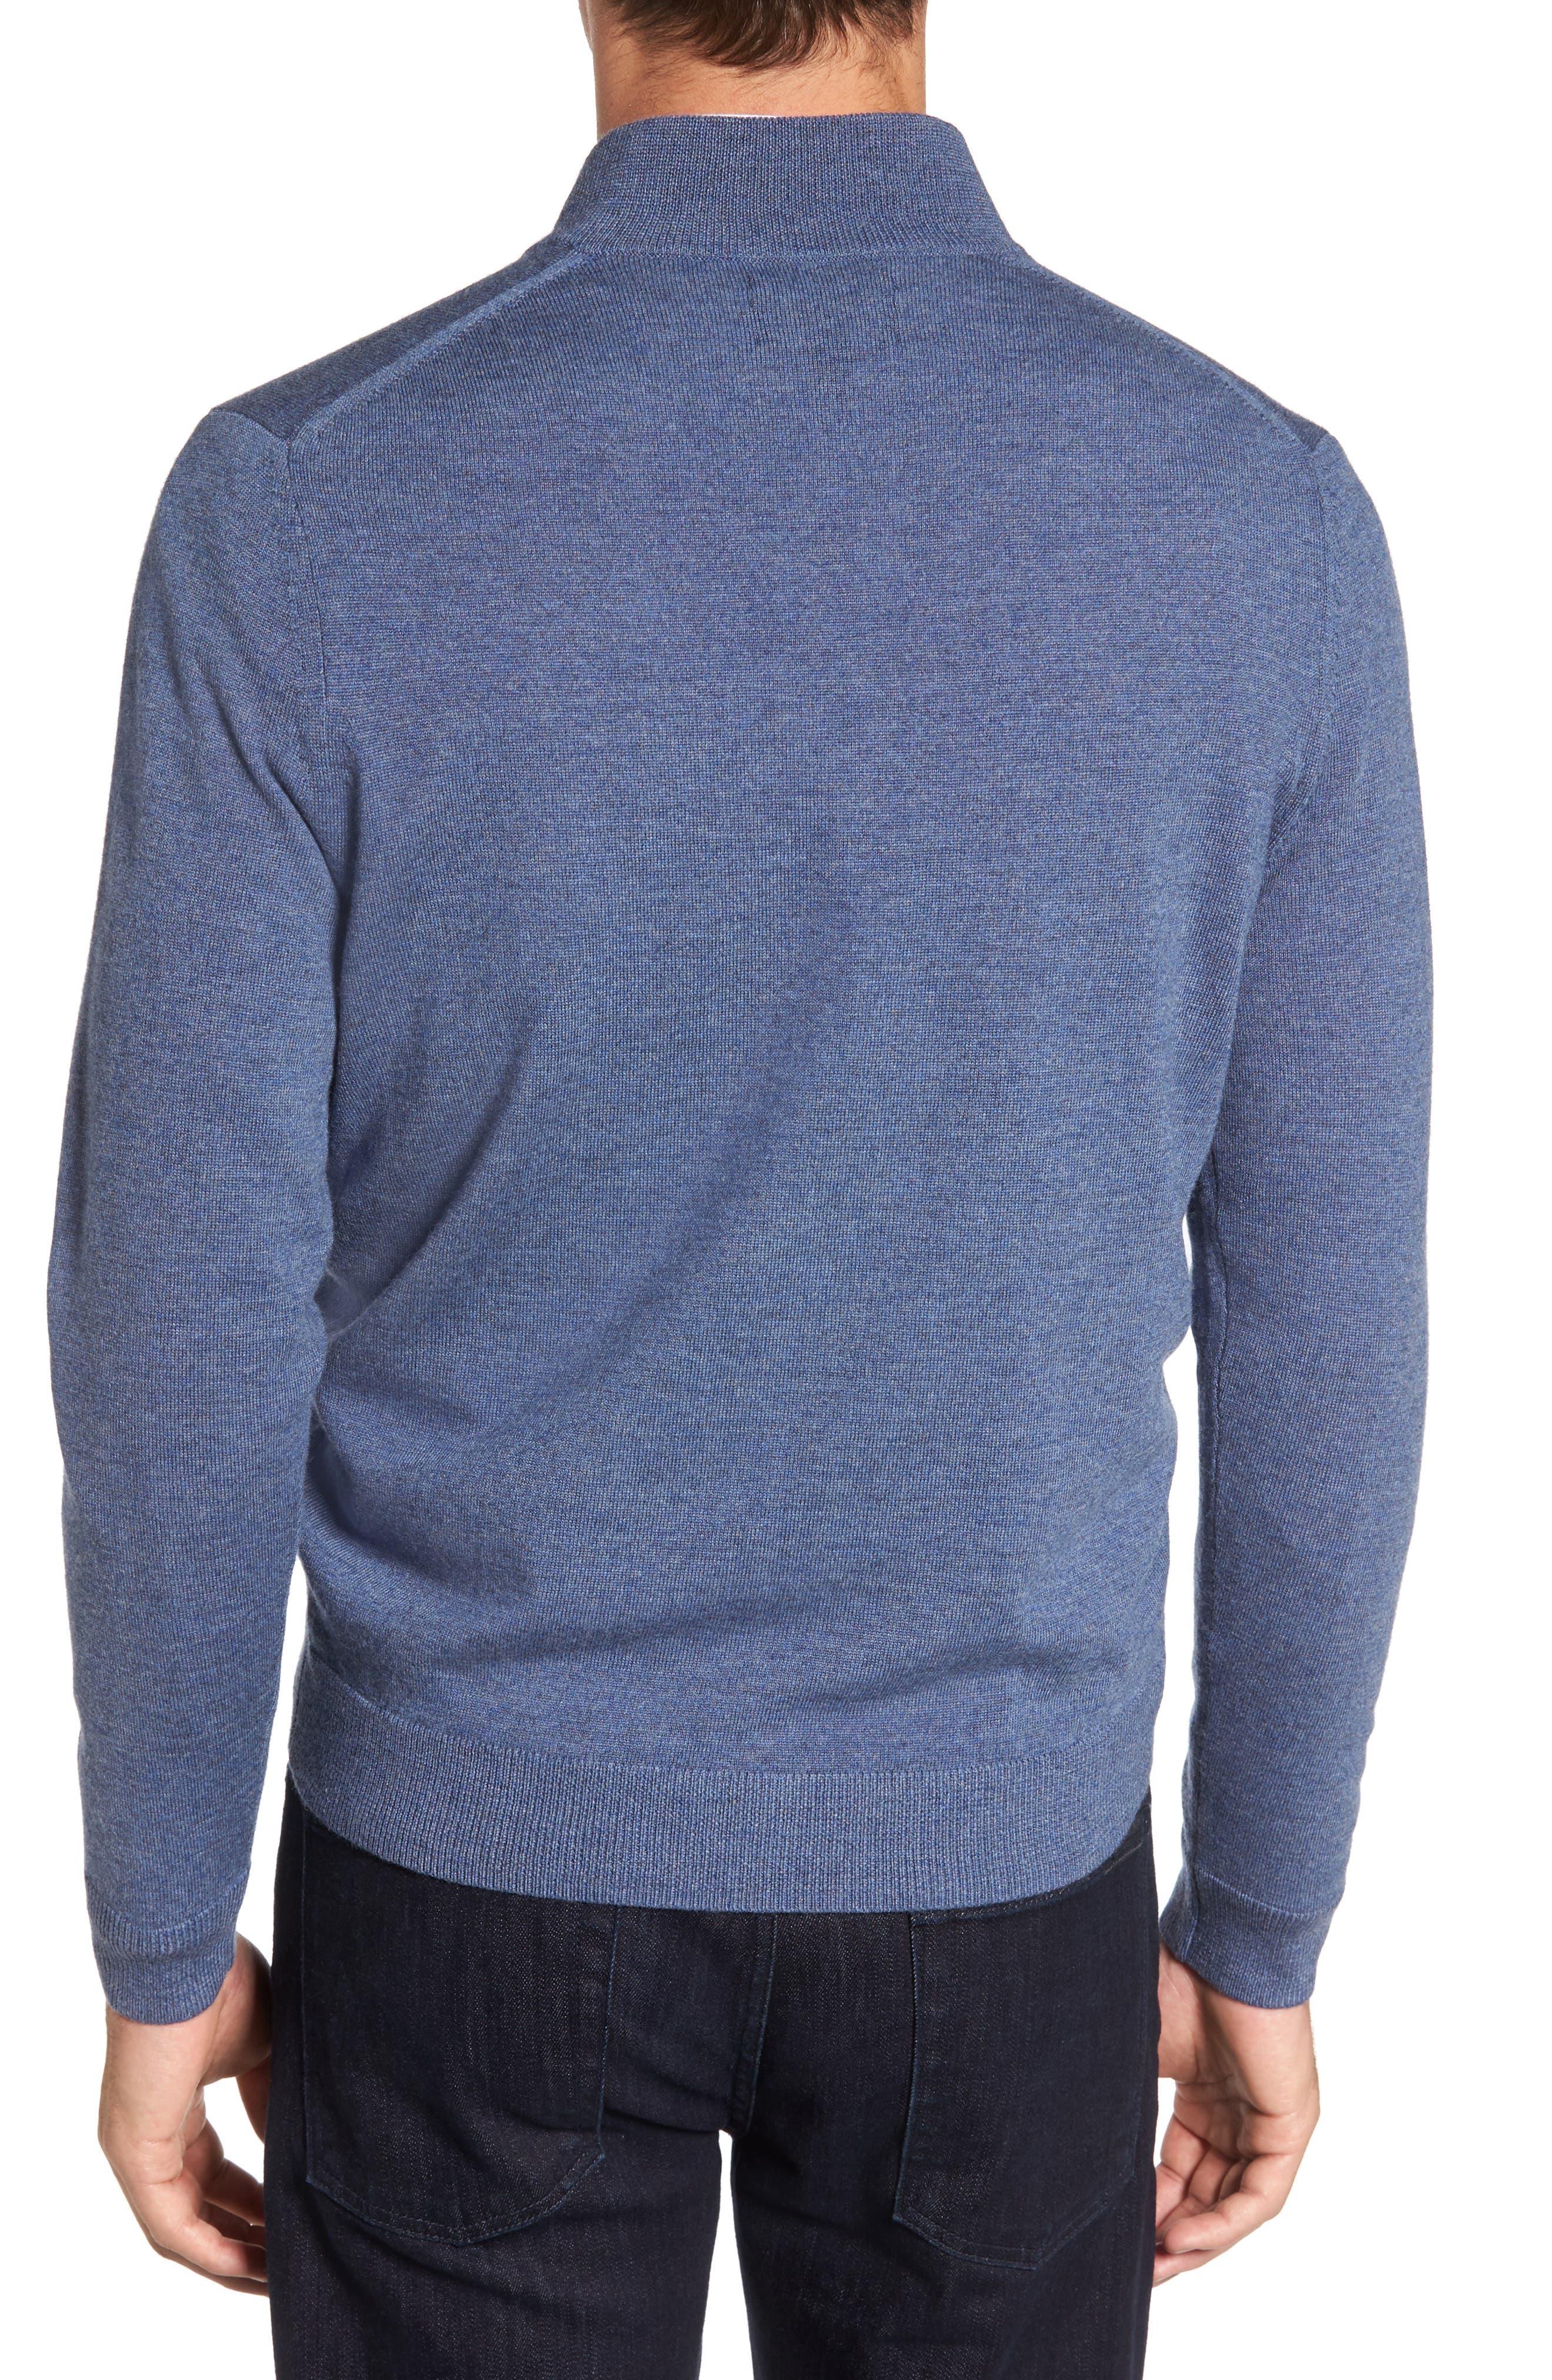 Alternate Image 2  - Nordstrom Men's Shop Quarter Zip Merino Wool Pullover